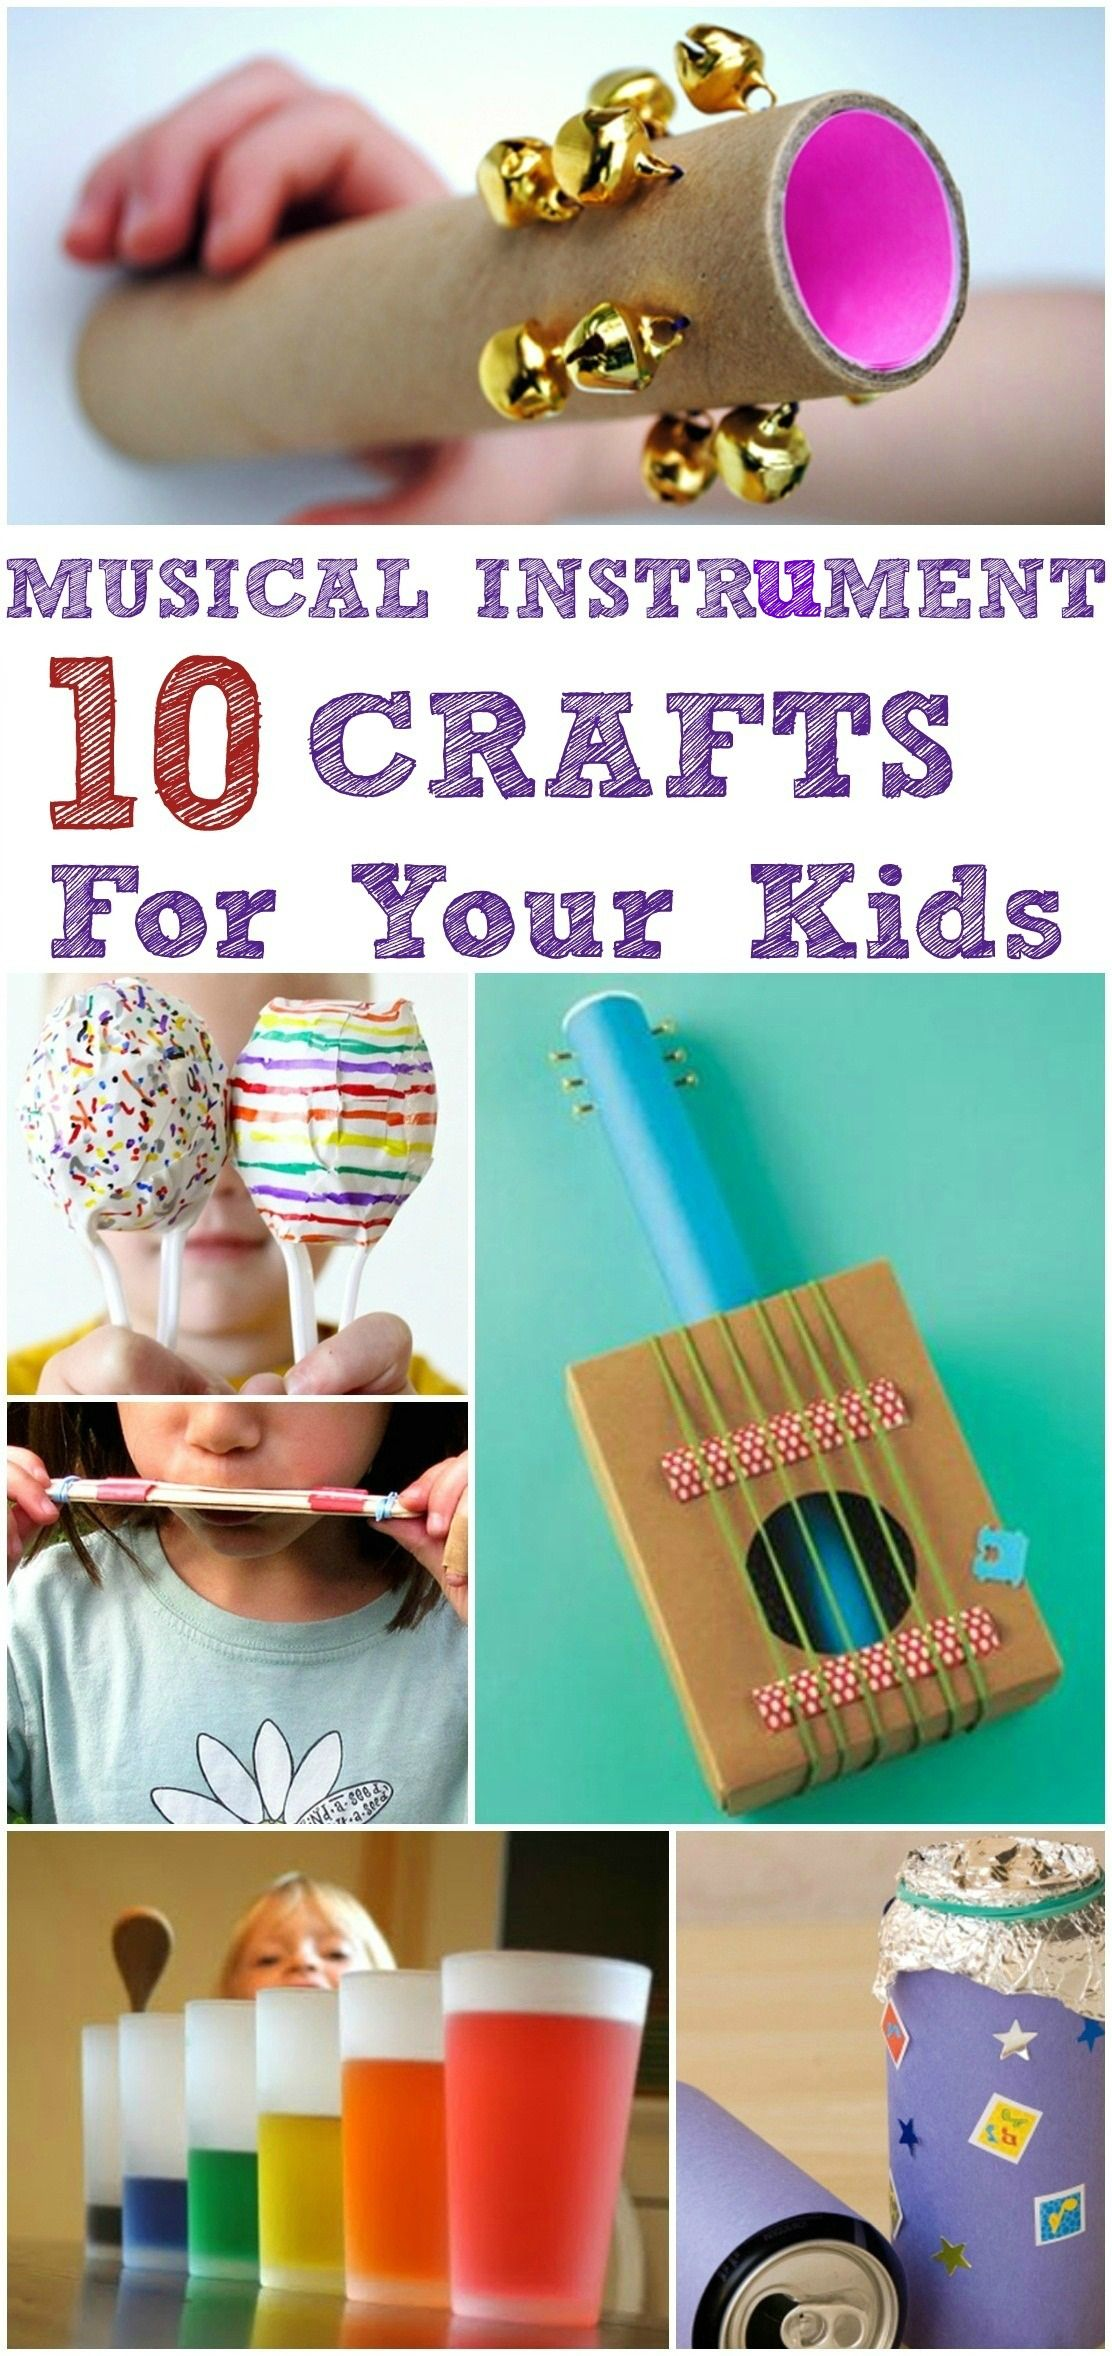 Top 10 Musical Instrument Crafts For Kids Instrument Musique